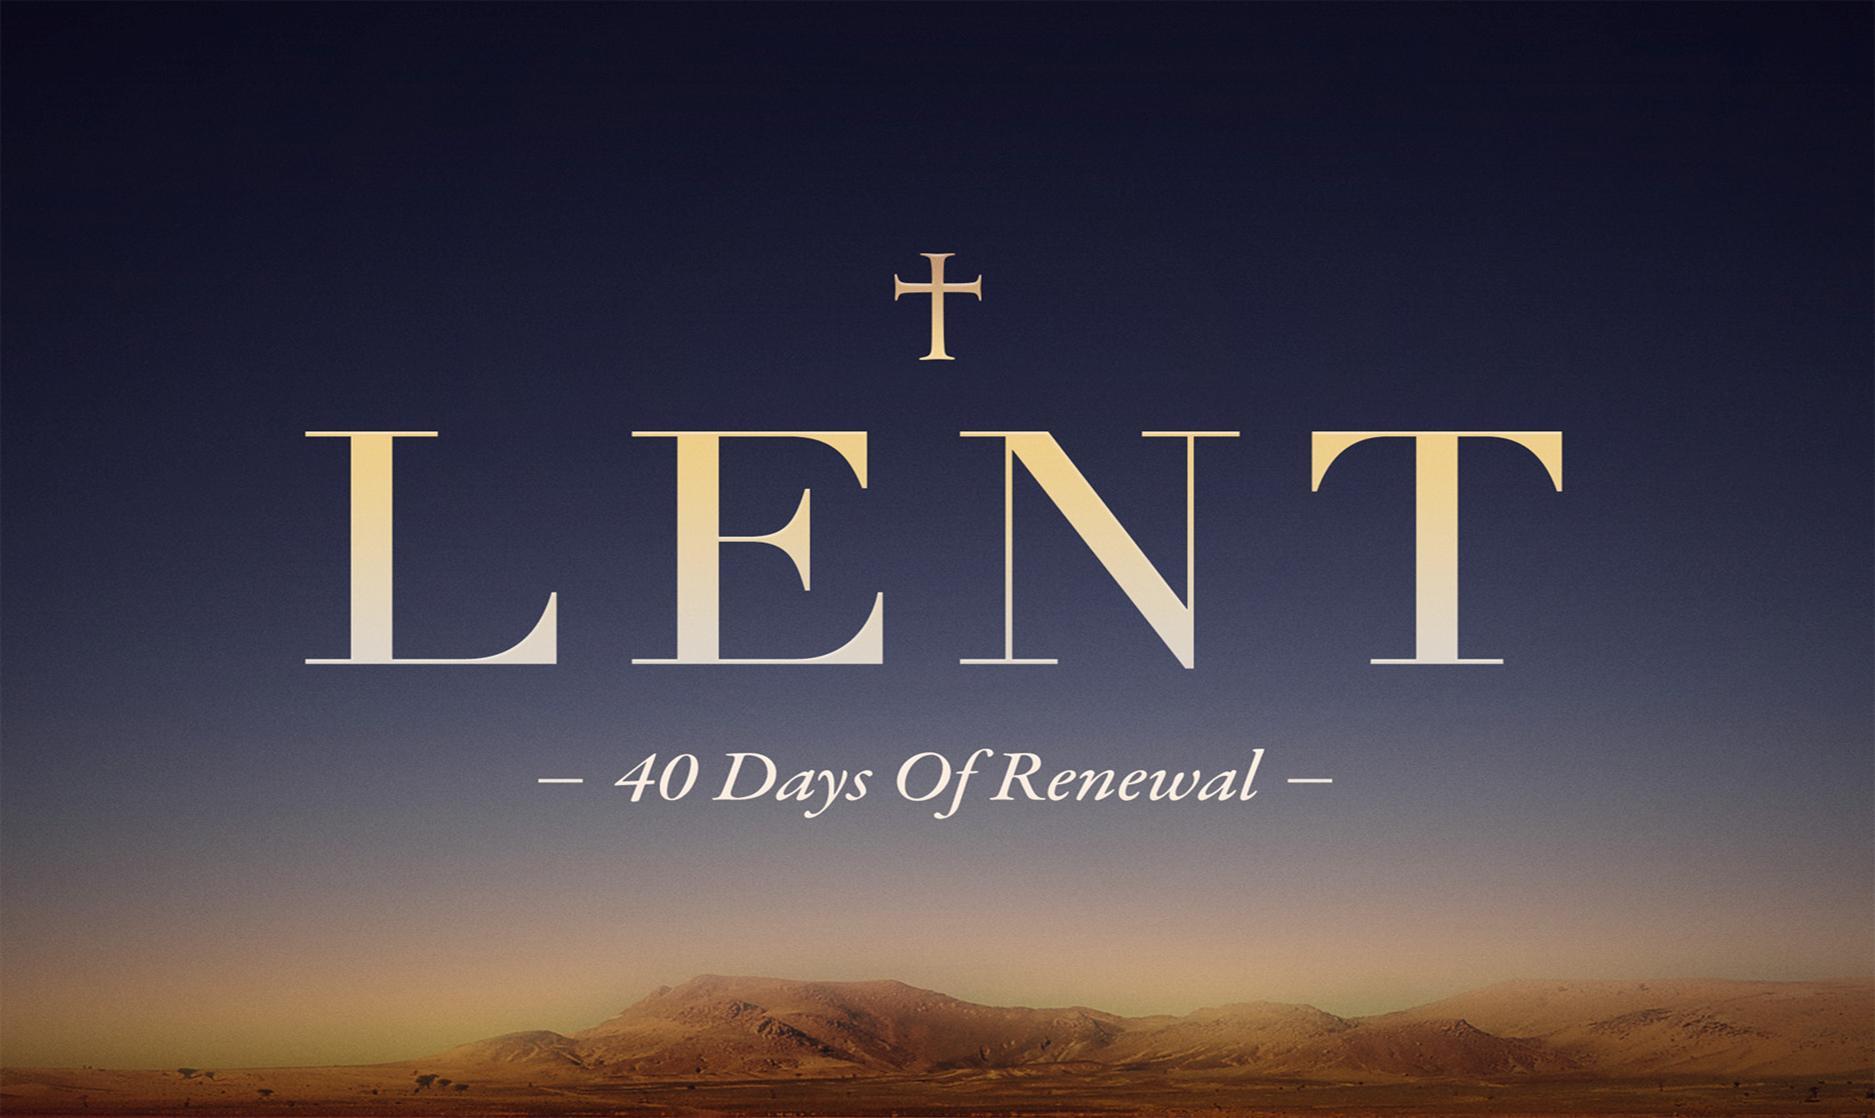 Lent: 40 Days of Renewal